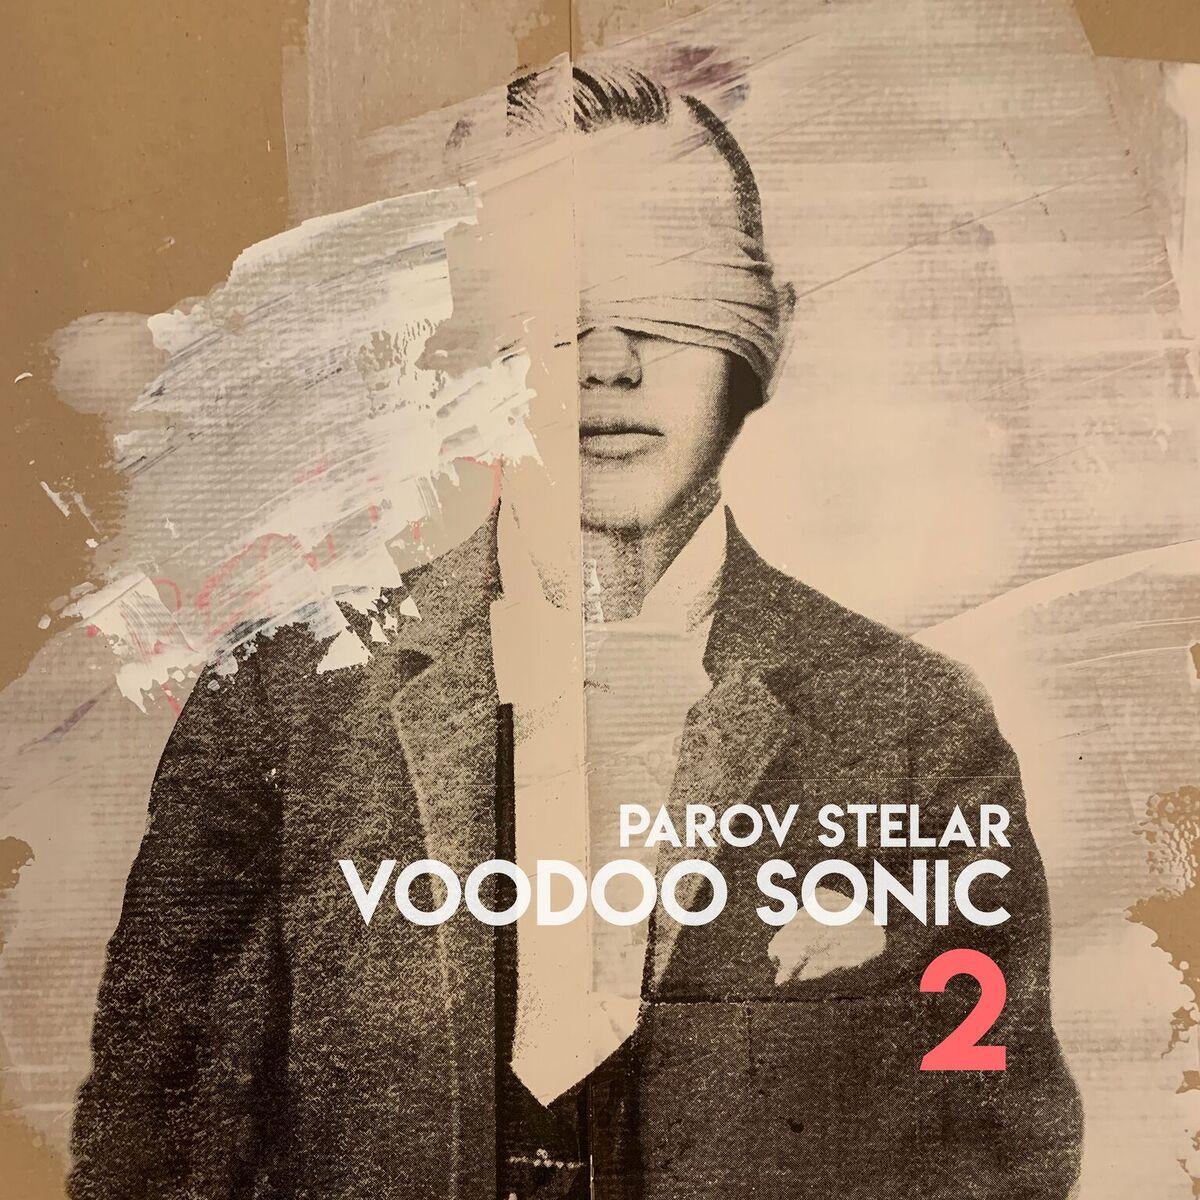 Voodoo Sonic 2 L'EP de Parov Stelar